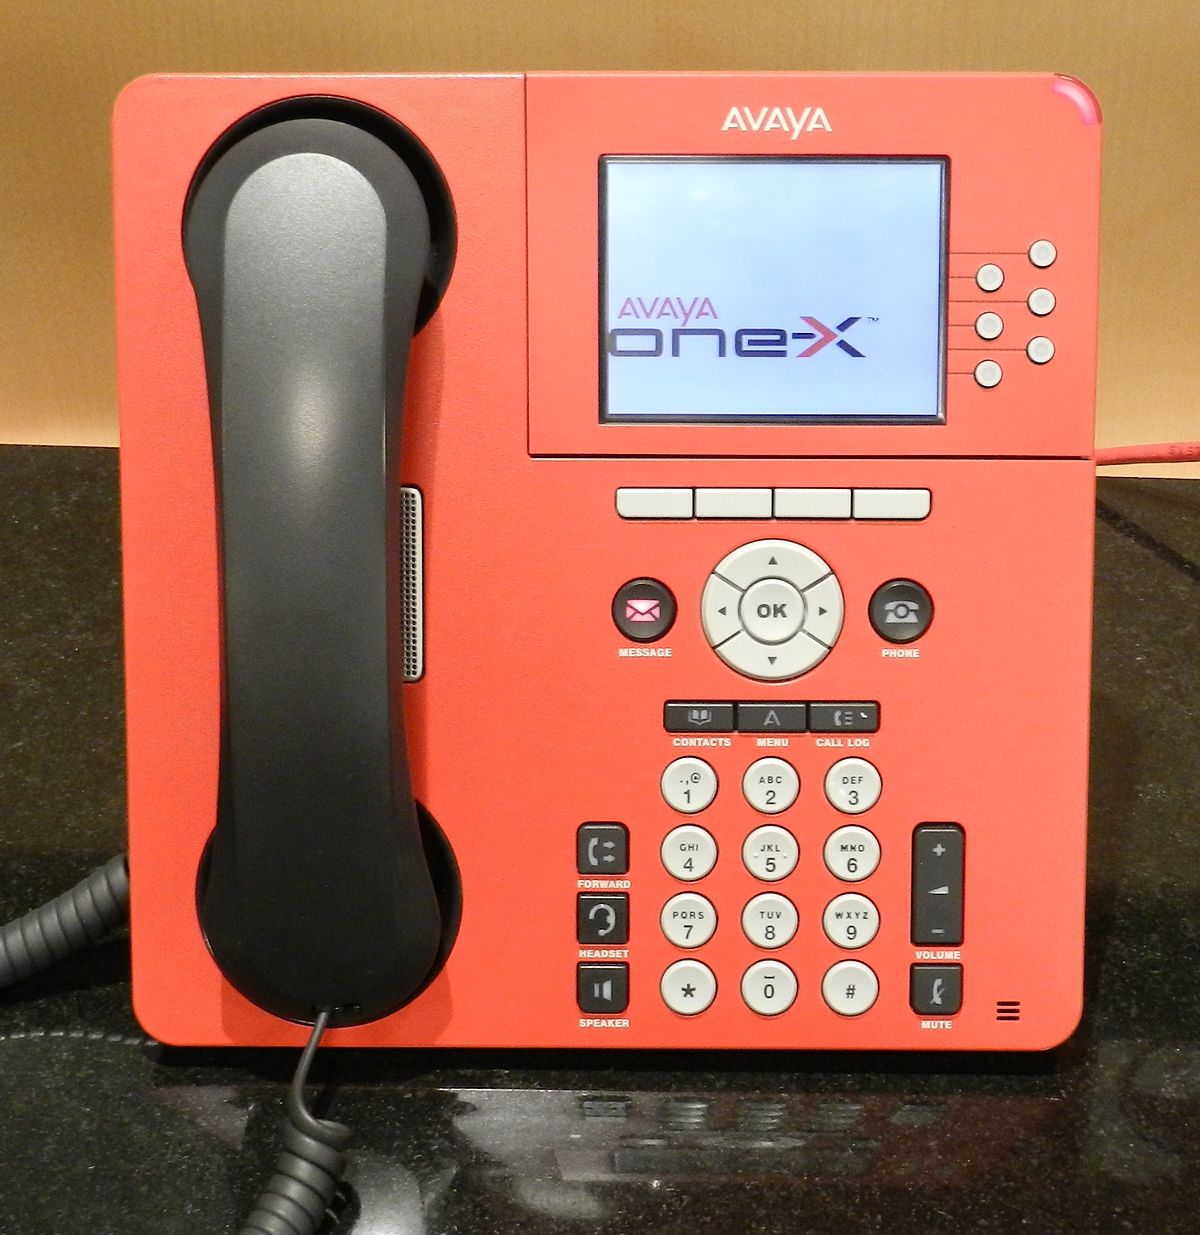 Avaya 9600-series IP deskphones - Wikipedia